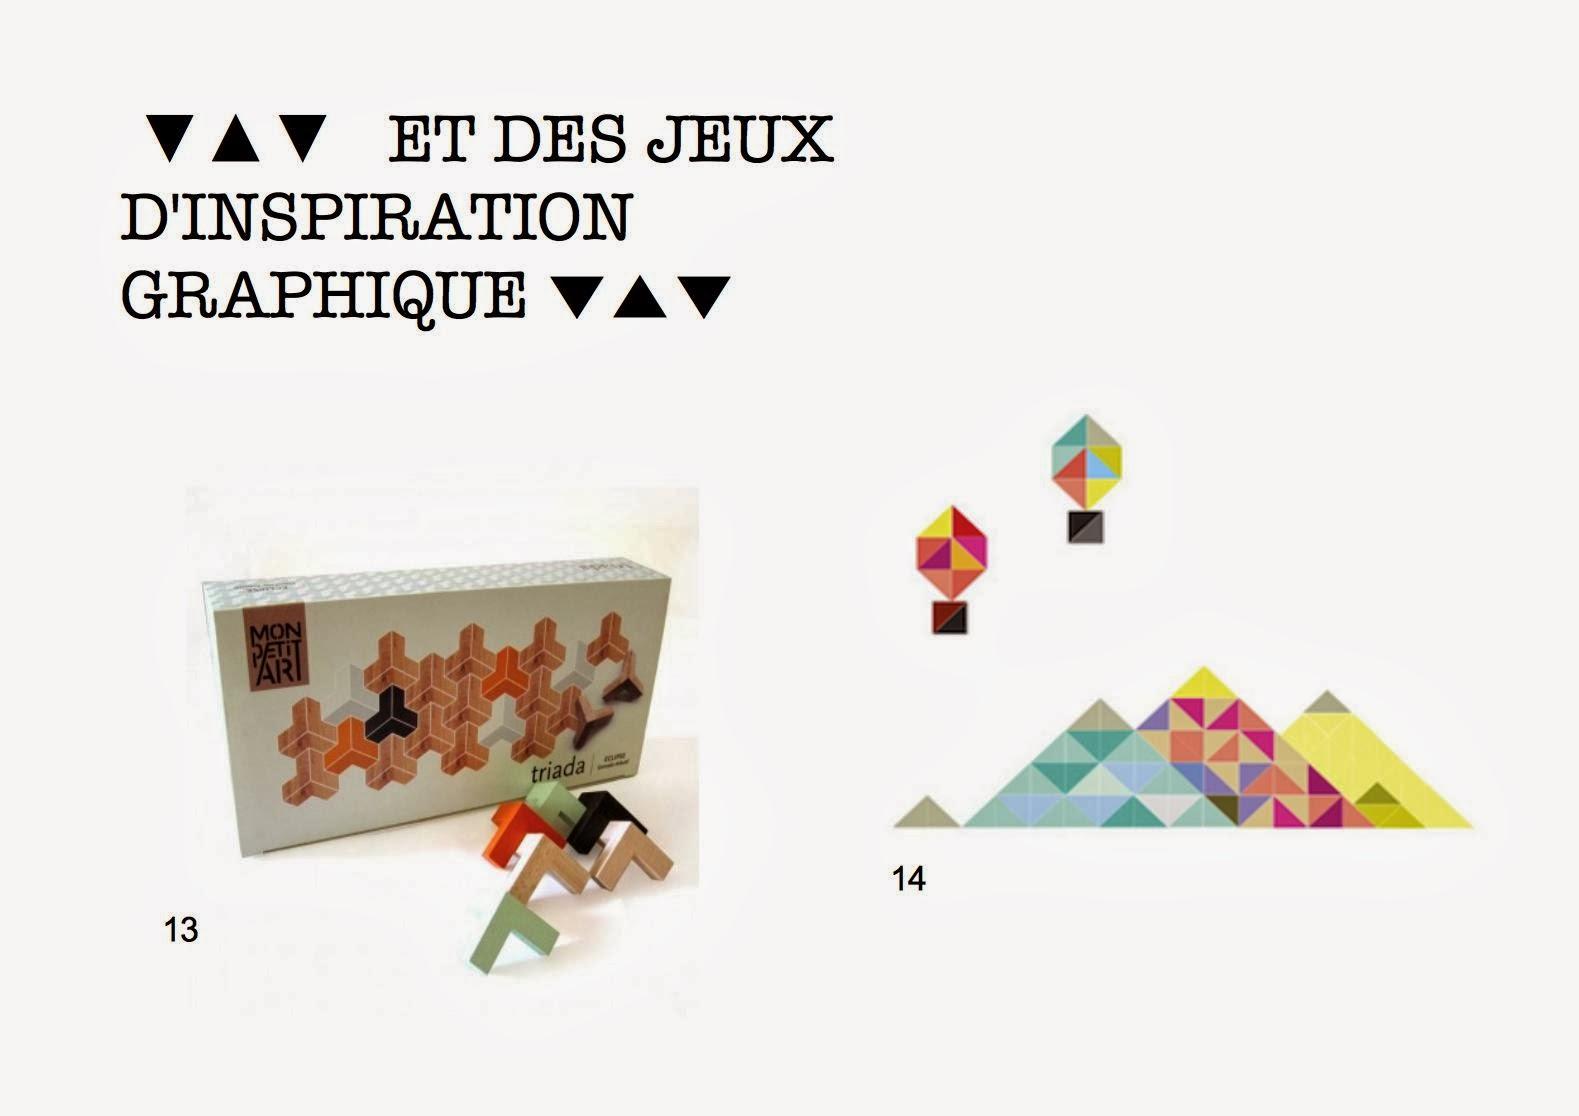 baby storming inspiration 15 graphique. Black Bedroom Furniture Sets. Home Design Ideas